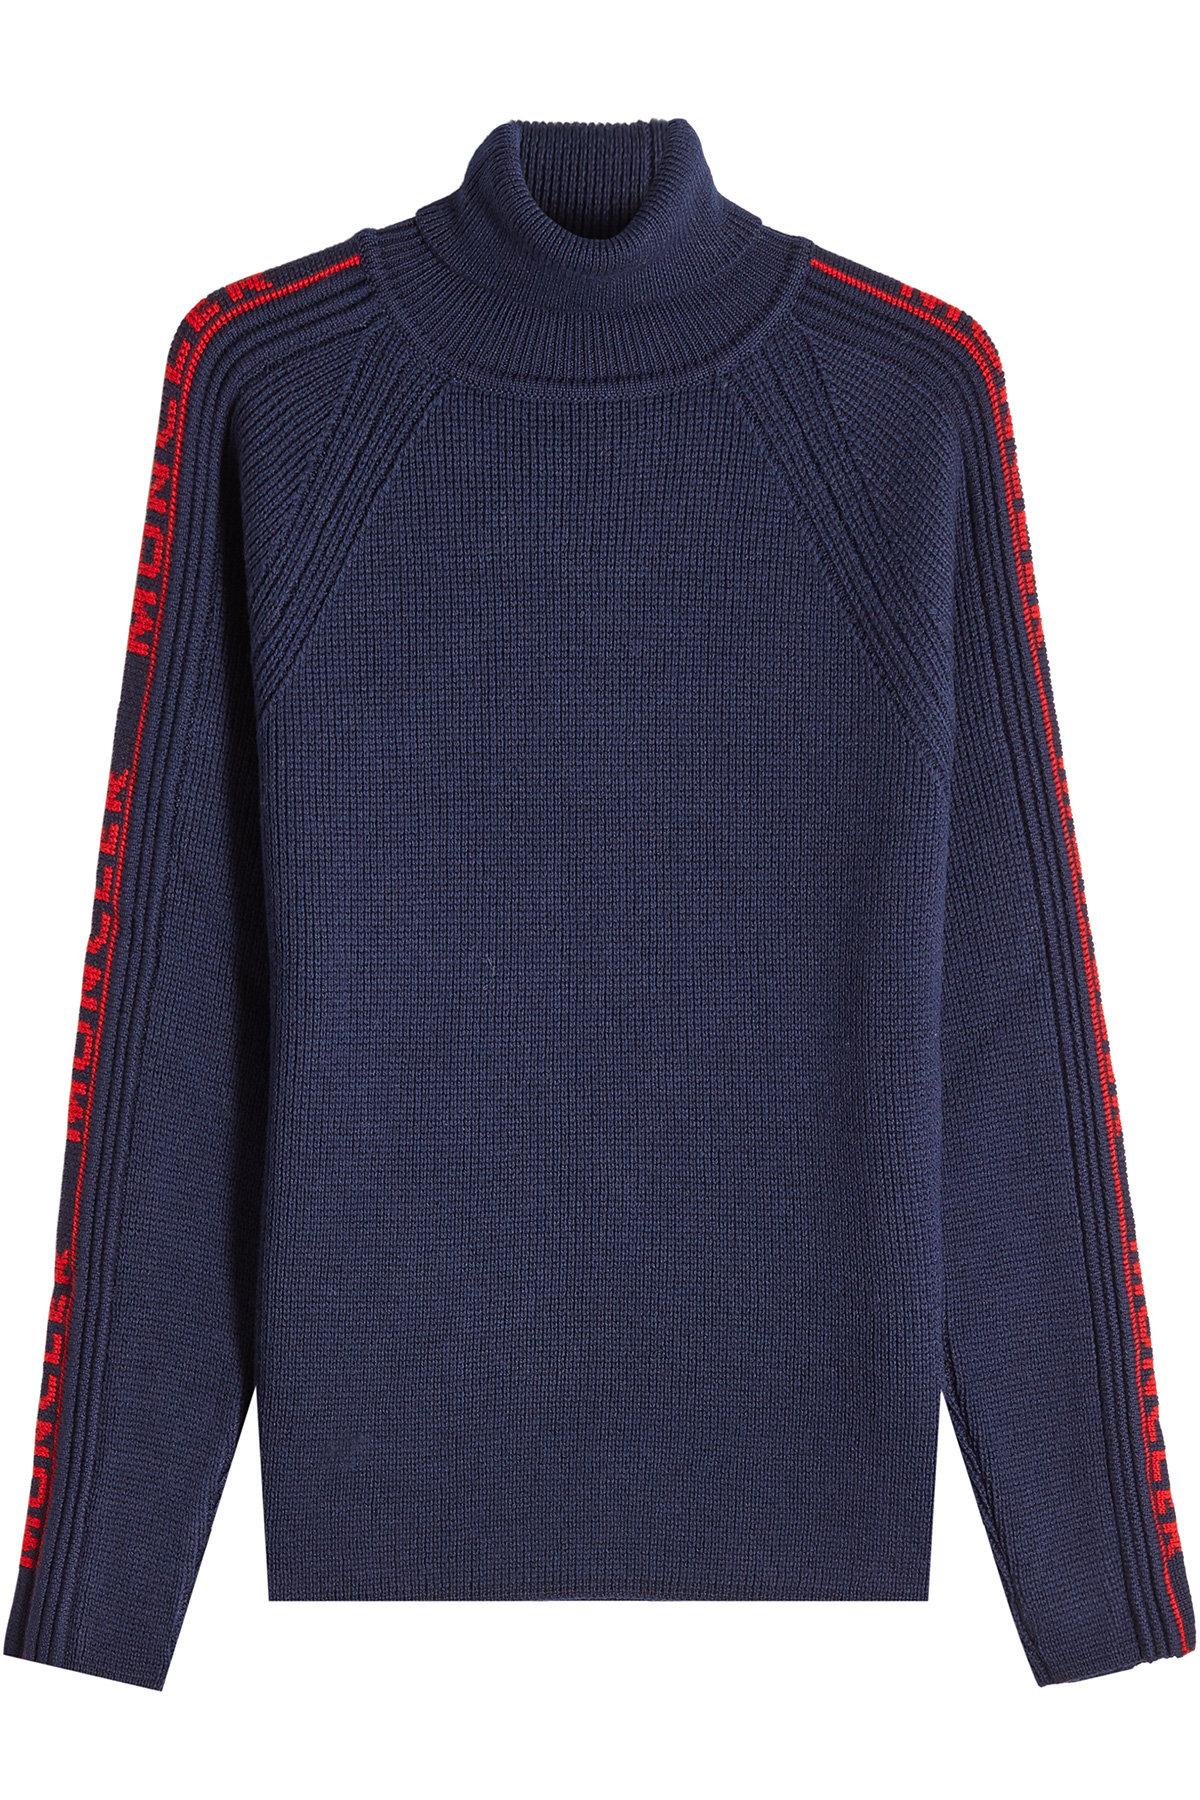 Wool Turtleneck Pullover - Moncler | WOMEN | US STYLEBOP.COM